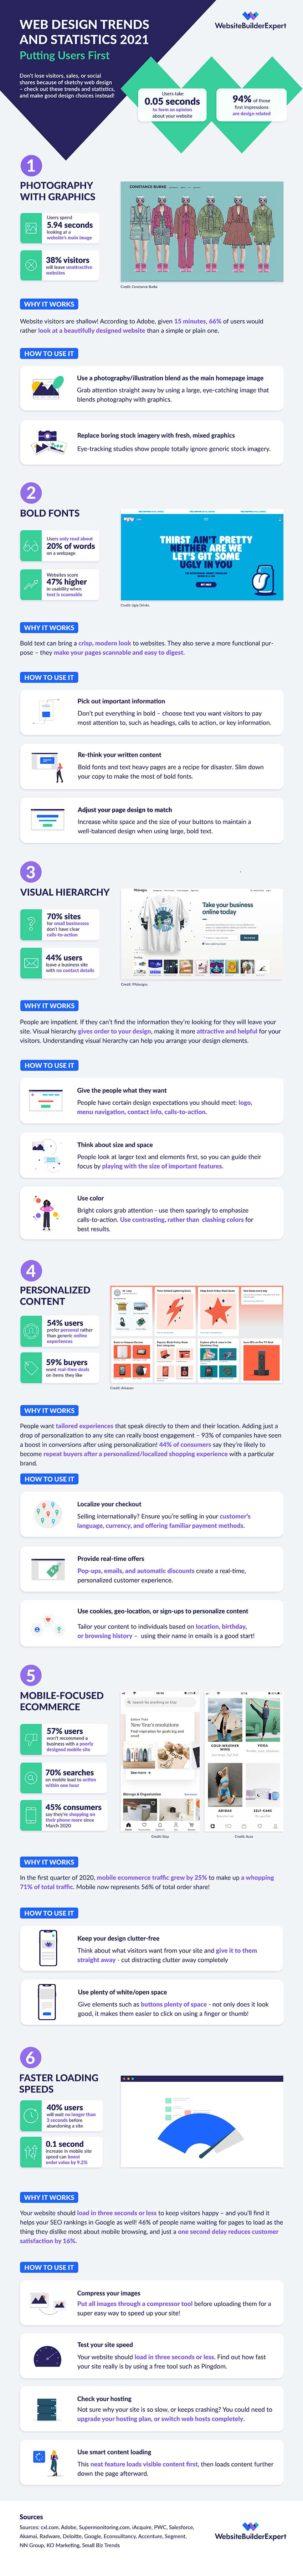 Web Design Trends Stats 2021